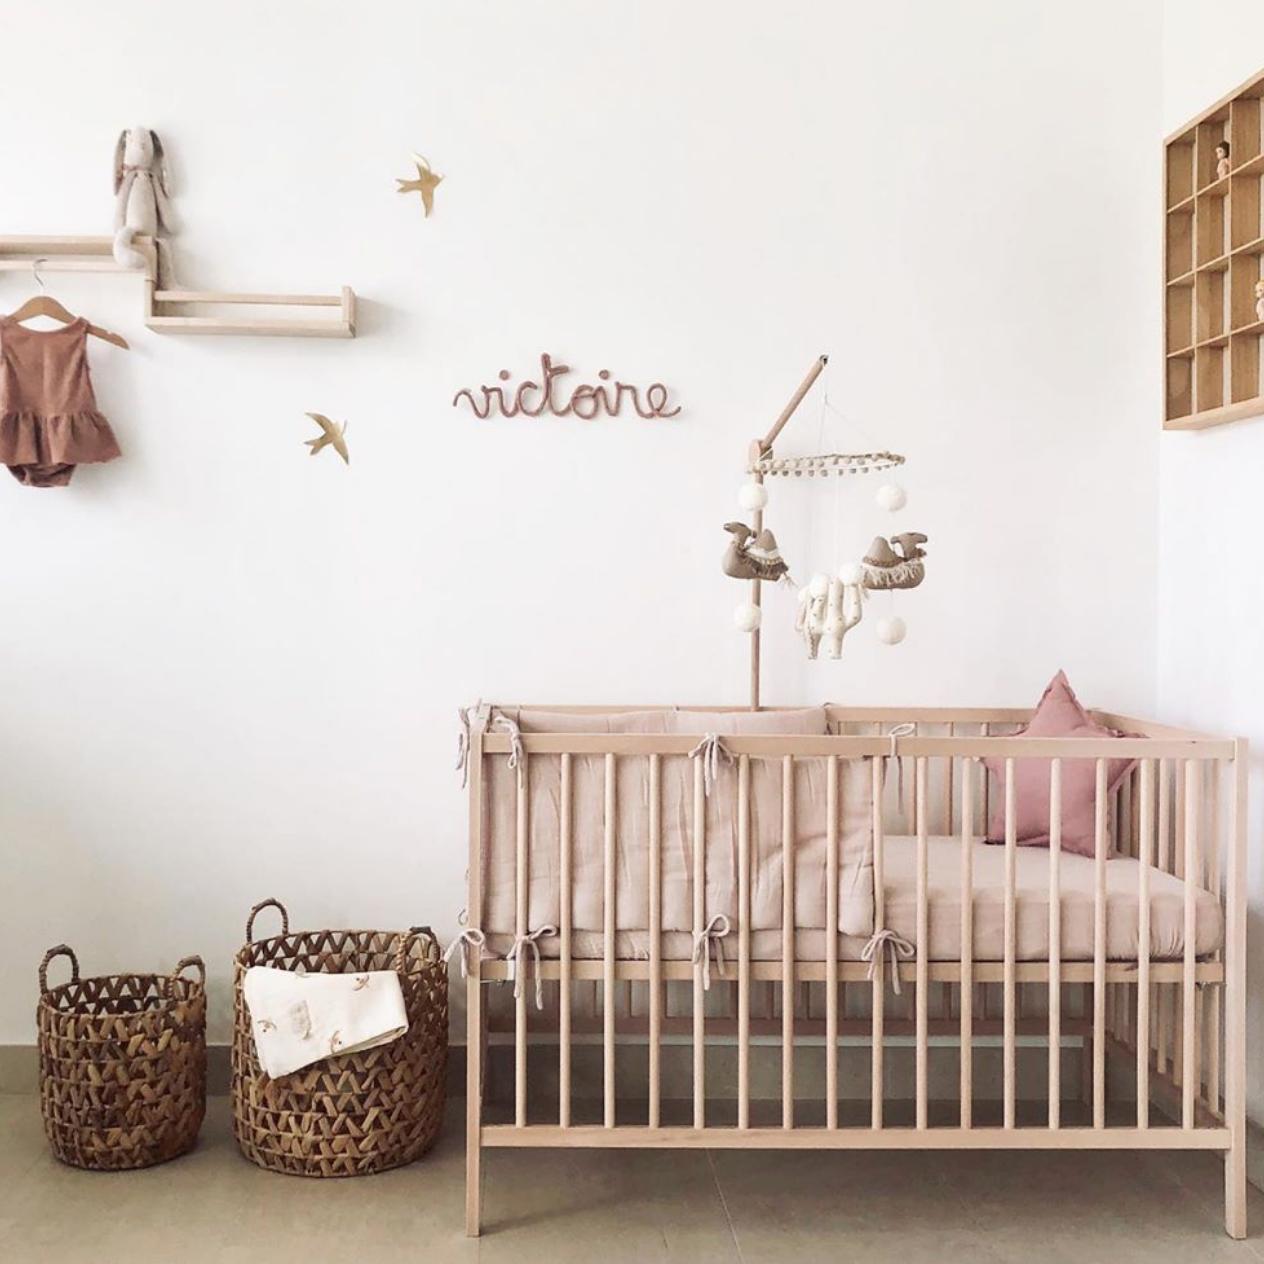 Lidor Babykamer Decoratie Zwaluw Nursery Decor Swallows Babykamer Decoratie Babykamer Inrichting Babykamer